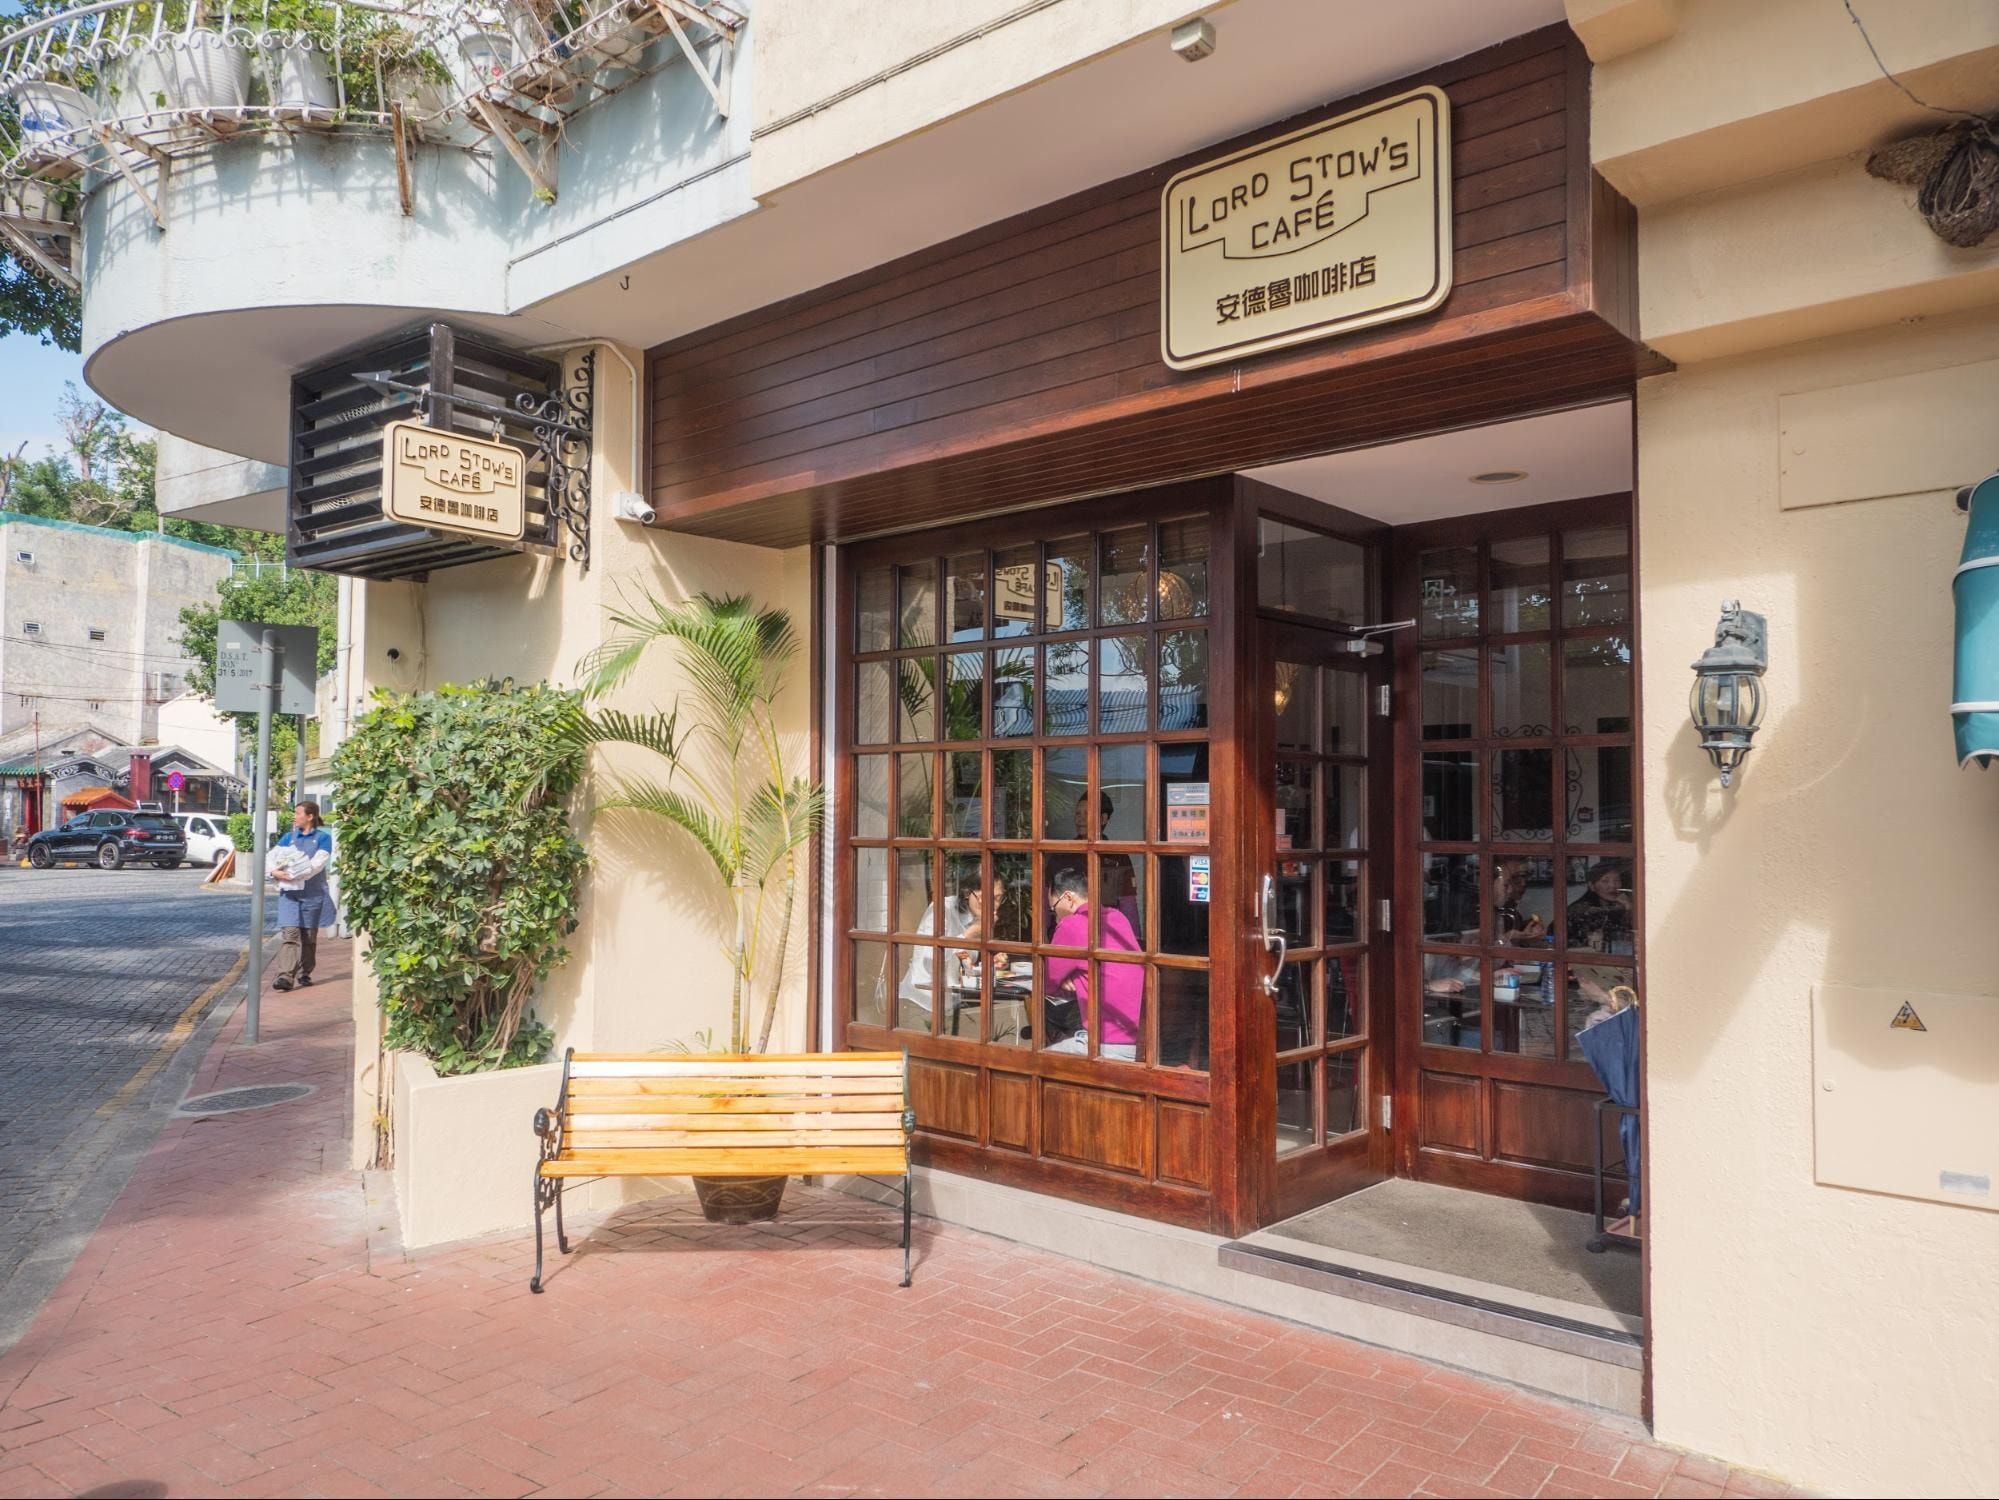 Lord-Stow's-bakery-Macau-egg-tarts